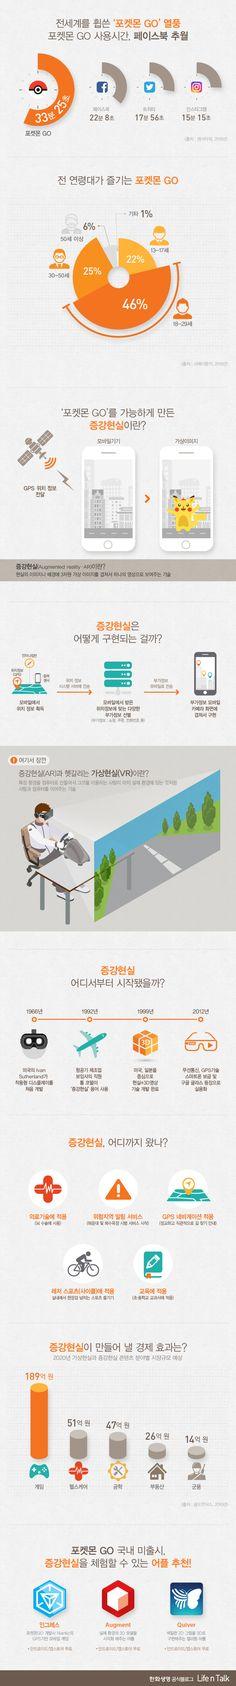 [Infographic] '포켓몬 Go'와 증강현실에 관한 인포그래픽